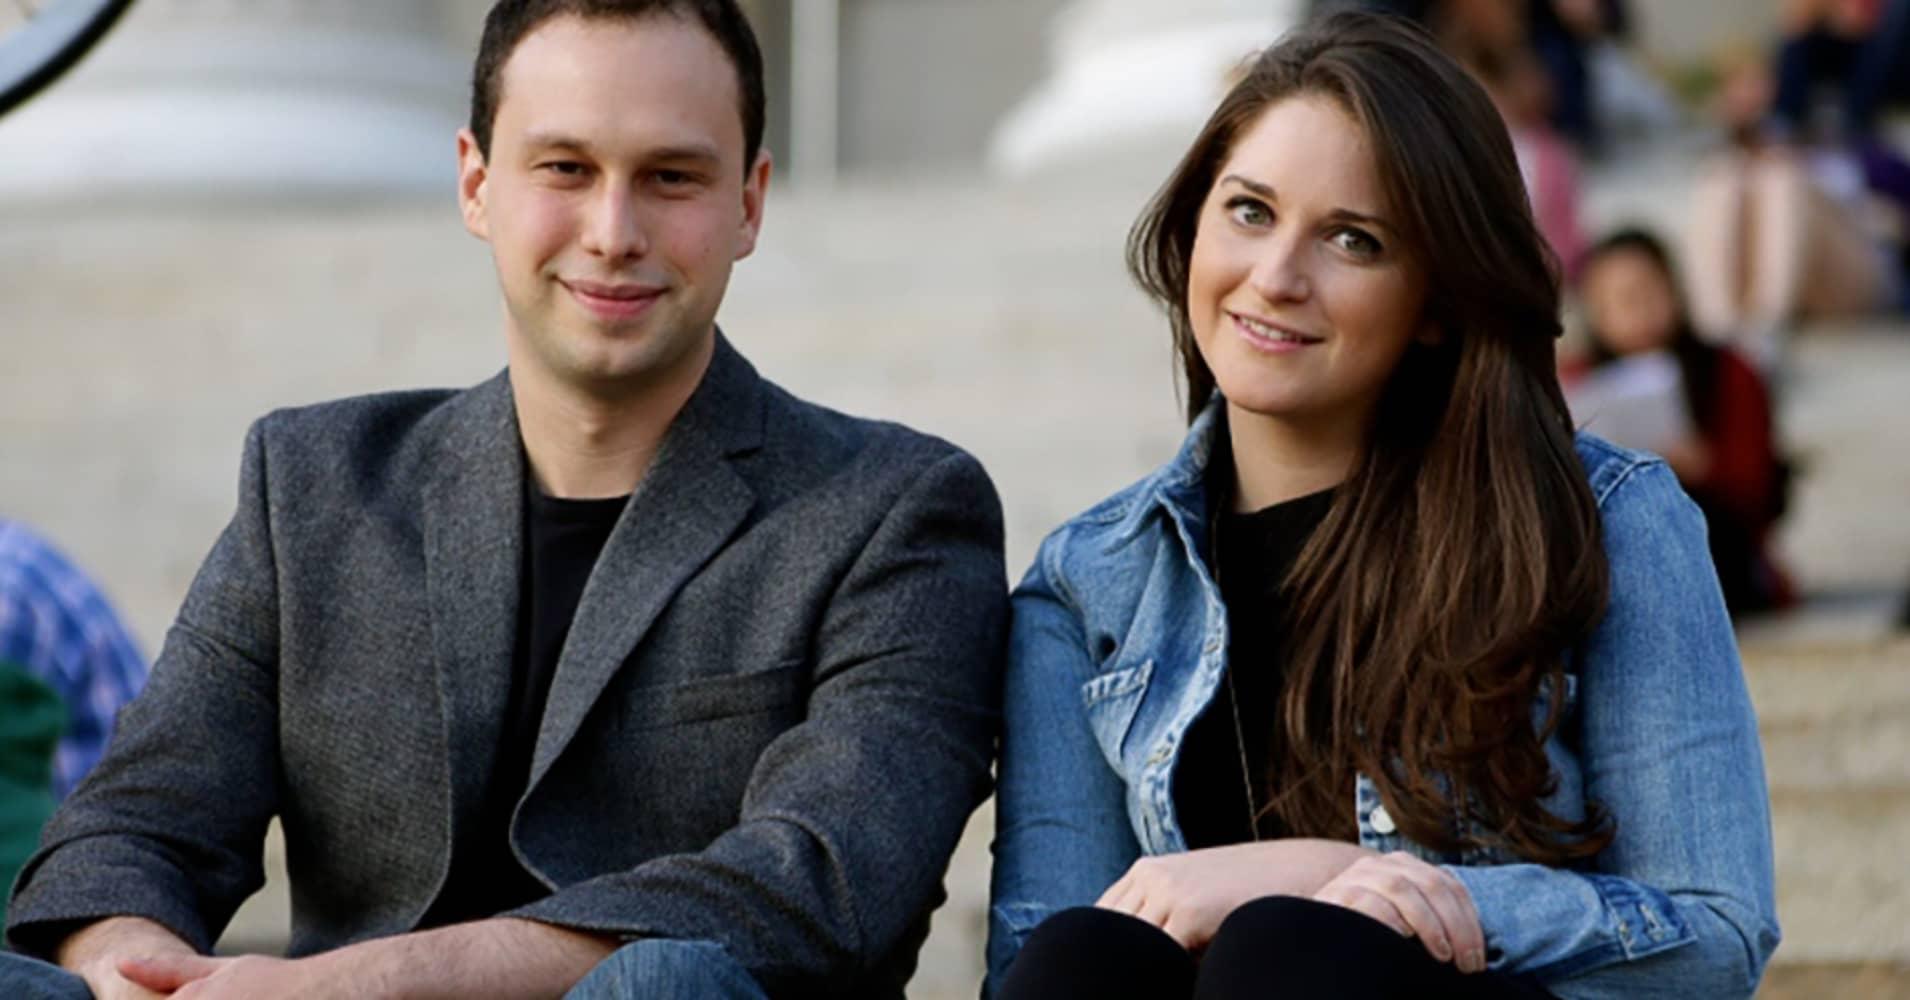 WayUp co-founders Liz Wessel and JJ Fliegelman